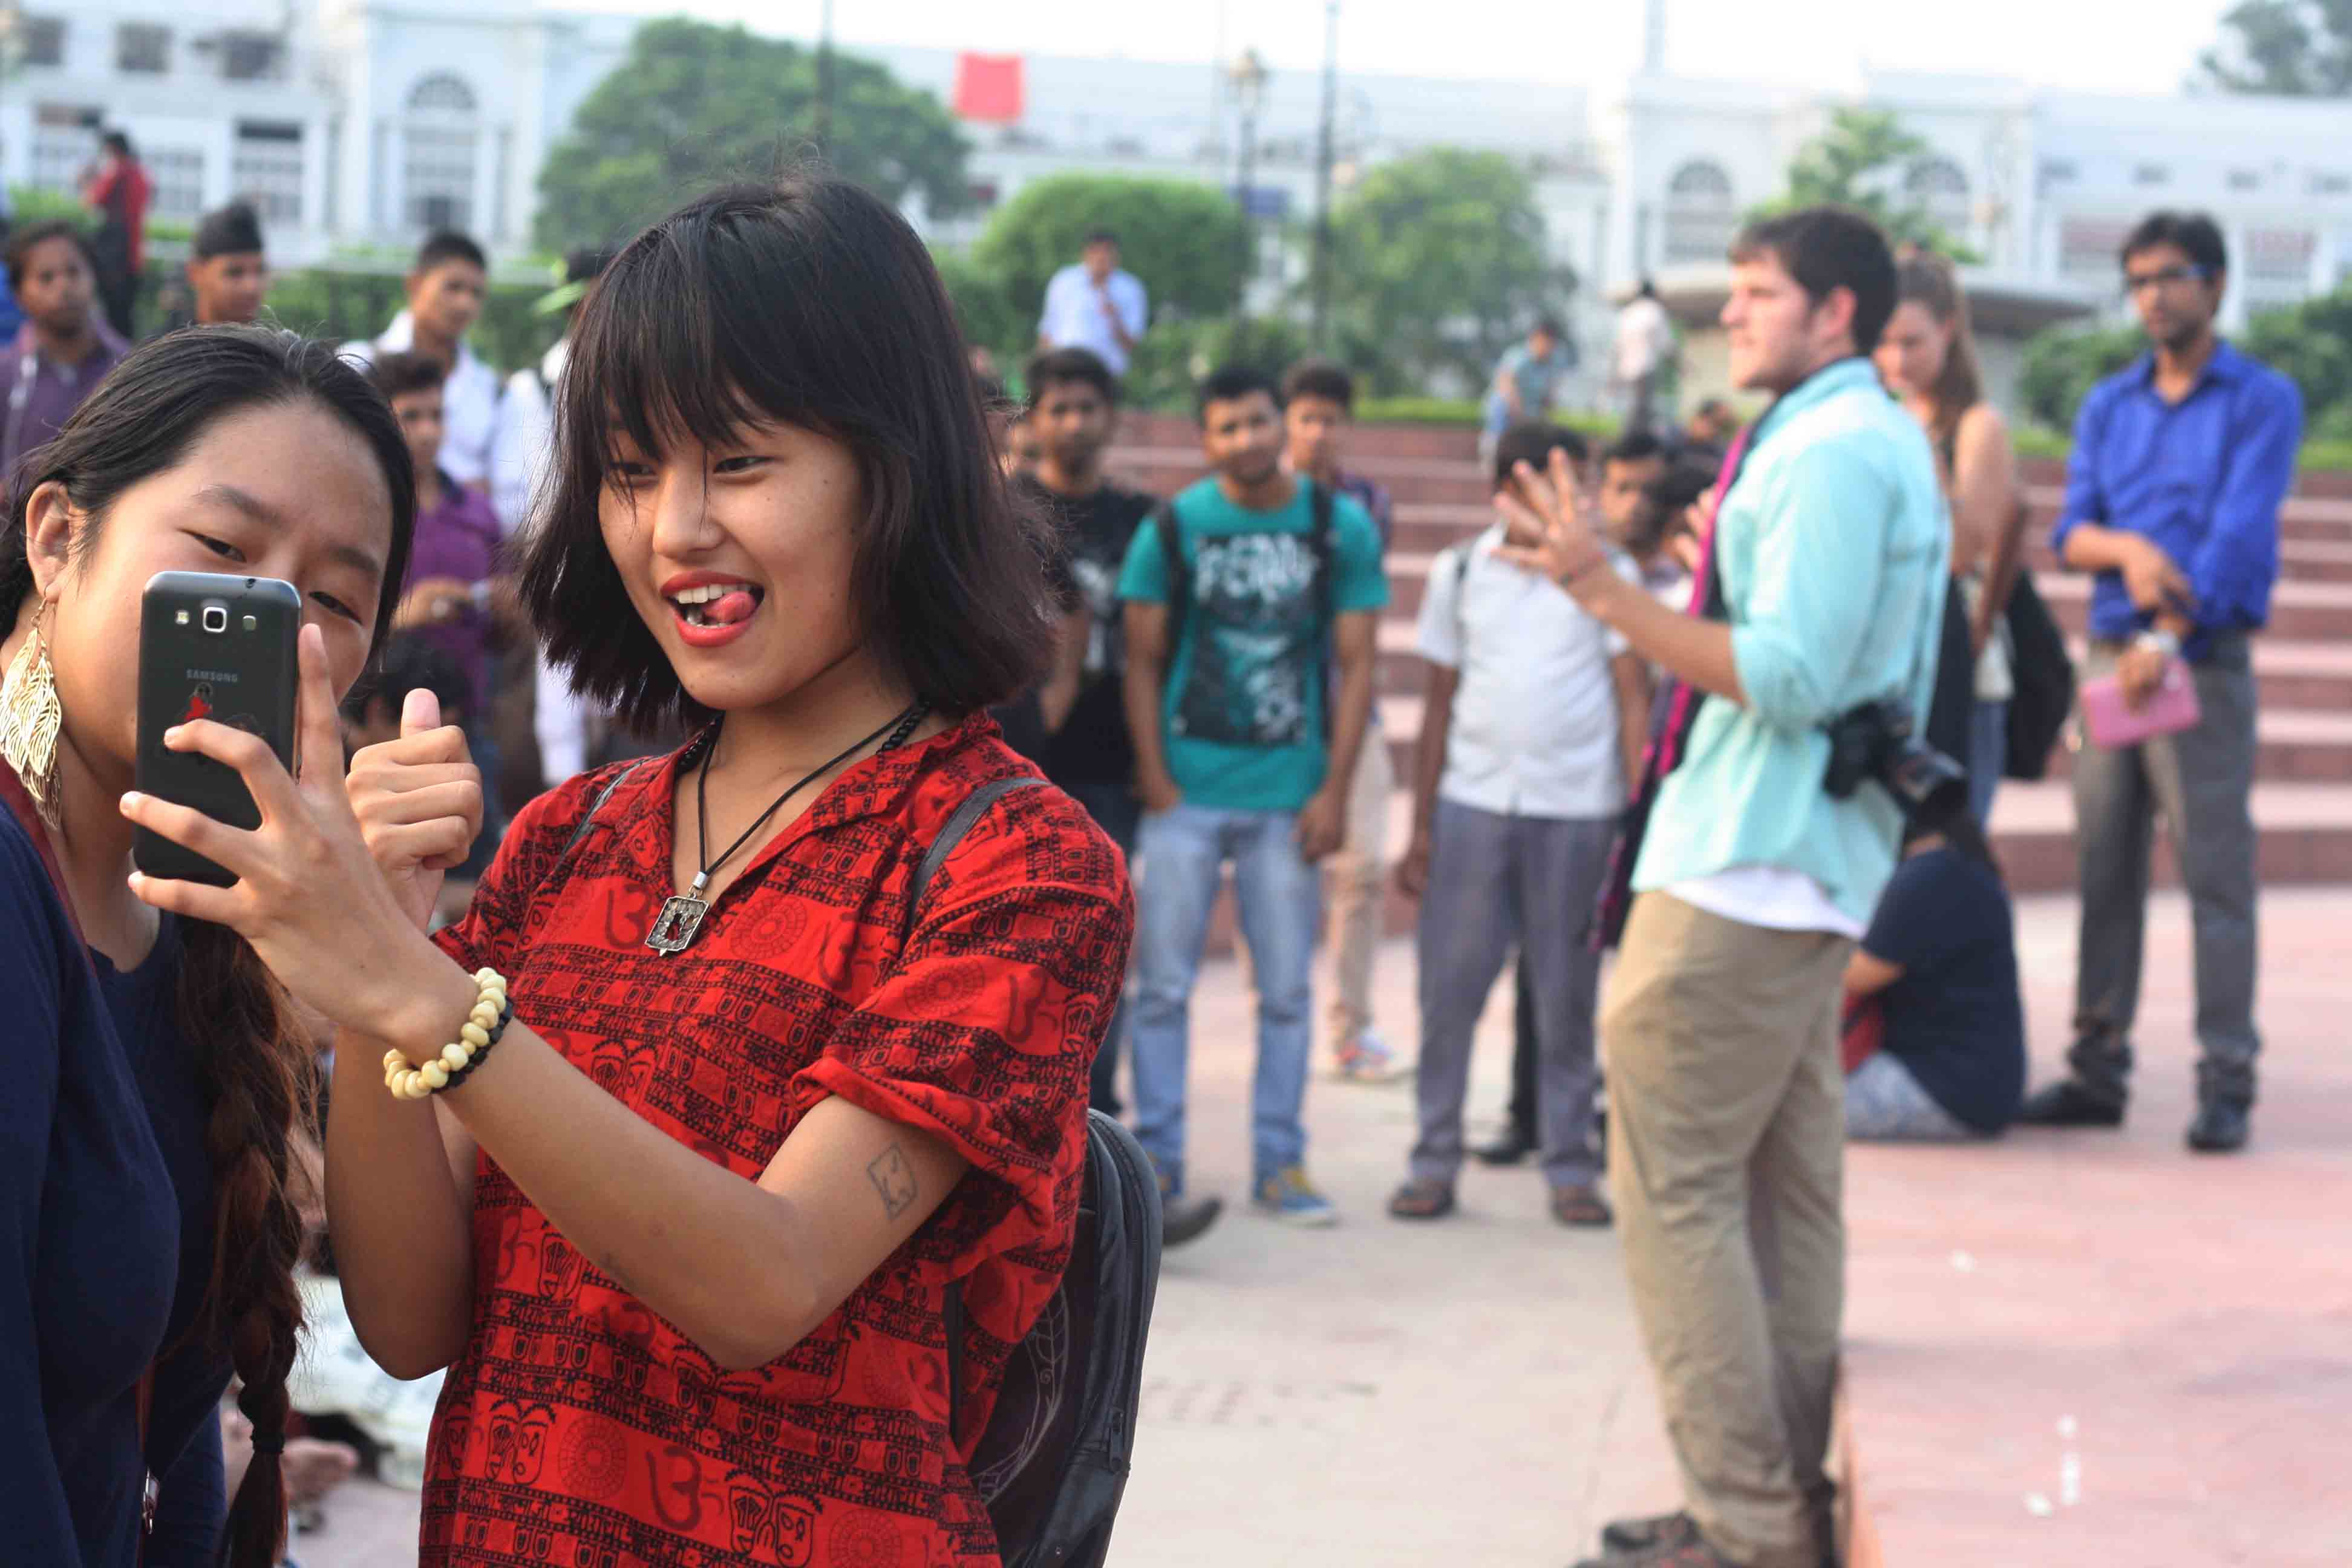 City Sighting - New York's Brandon Stanton & Non-Humans of New Delhi, Central Park